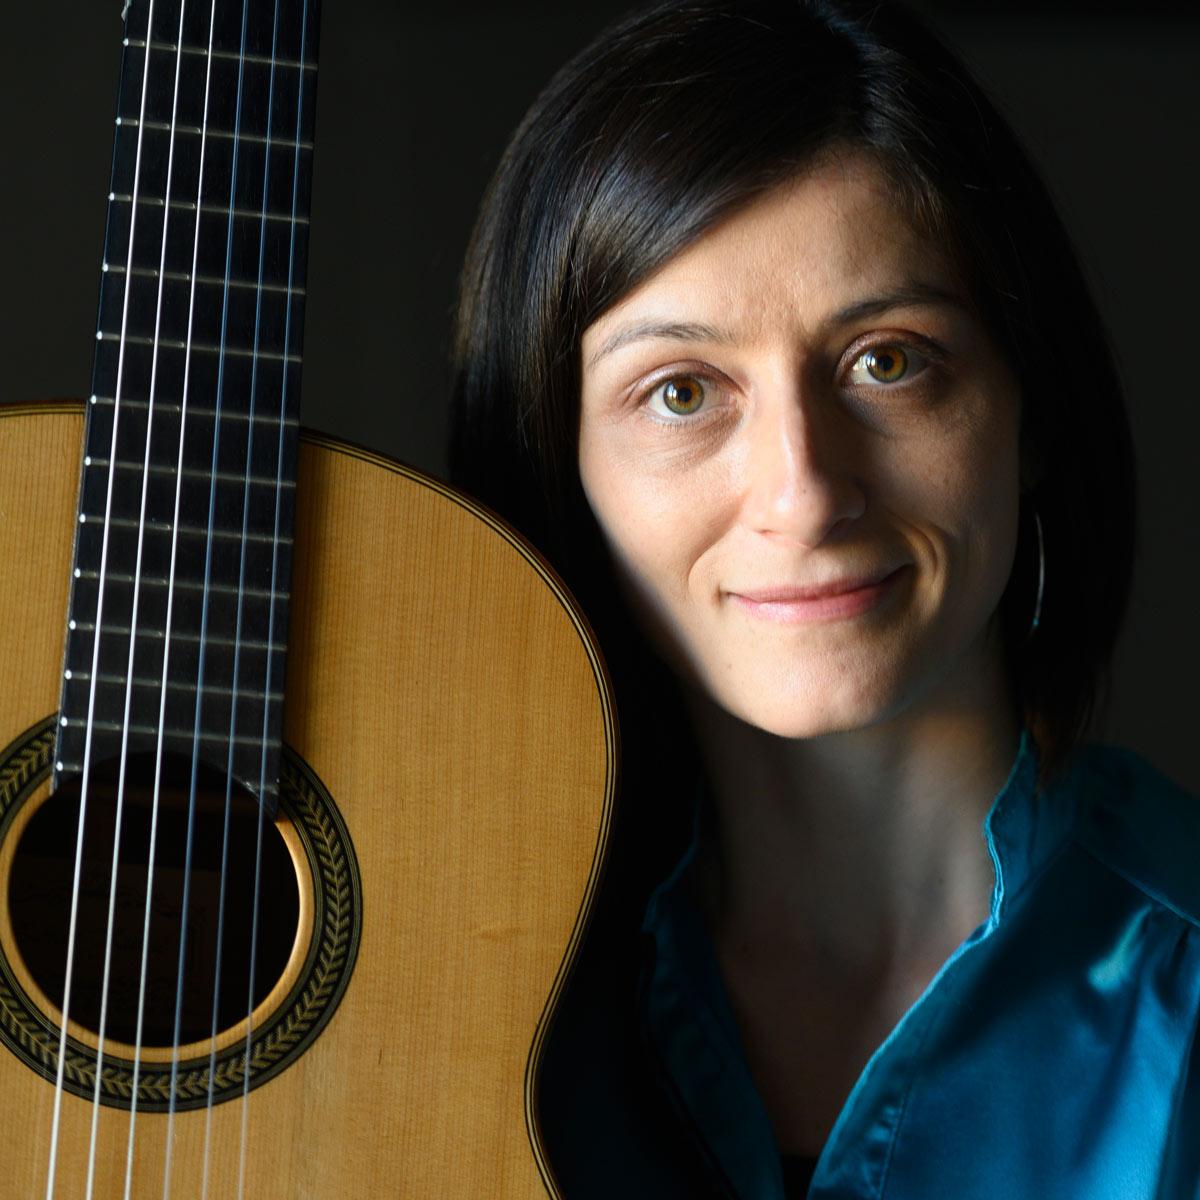 Milena Petkovic, D.M.A. Candidate